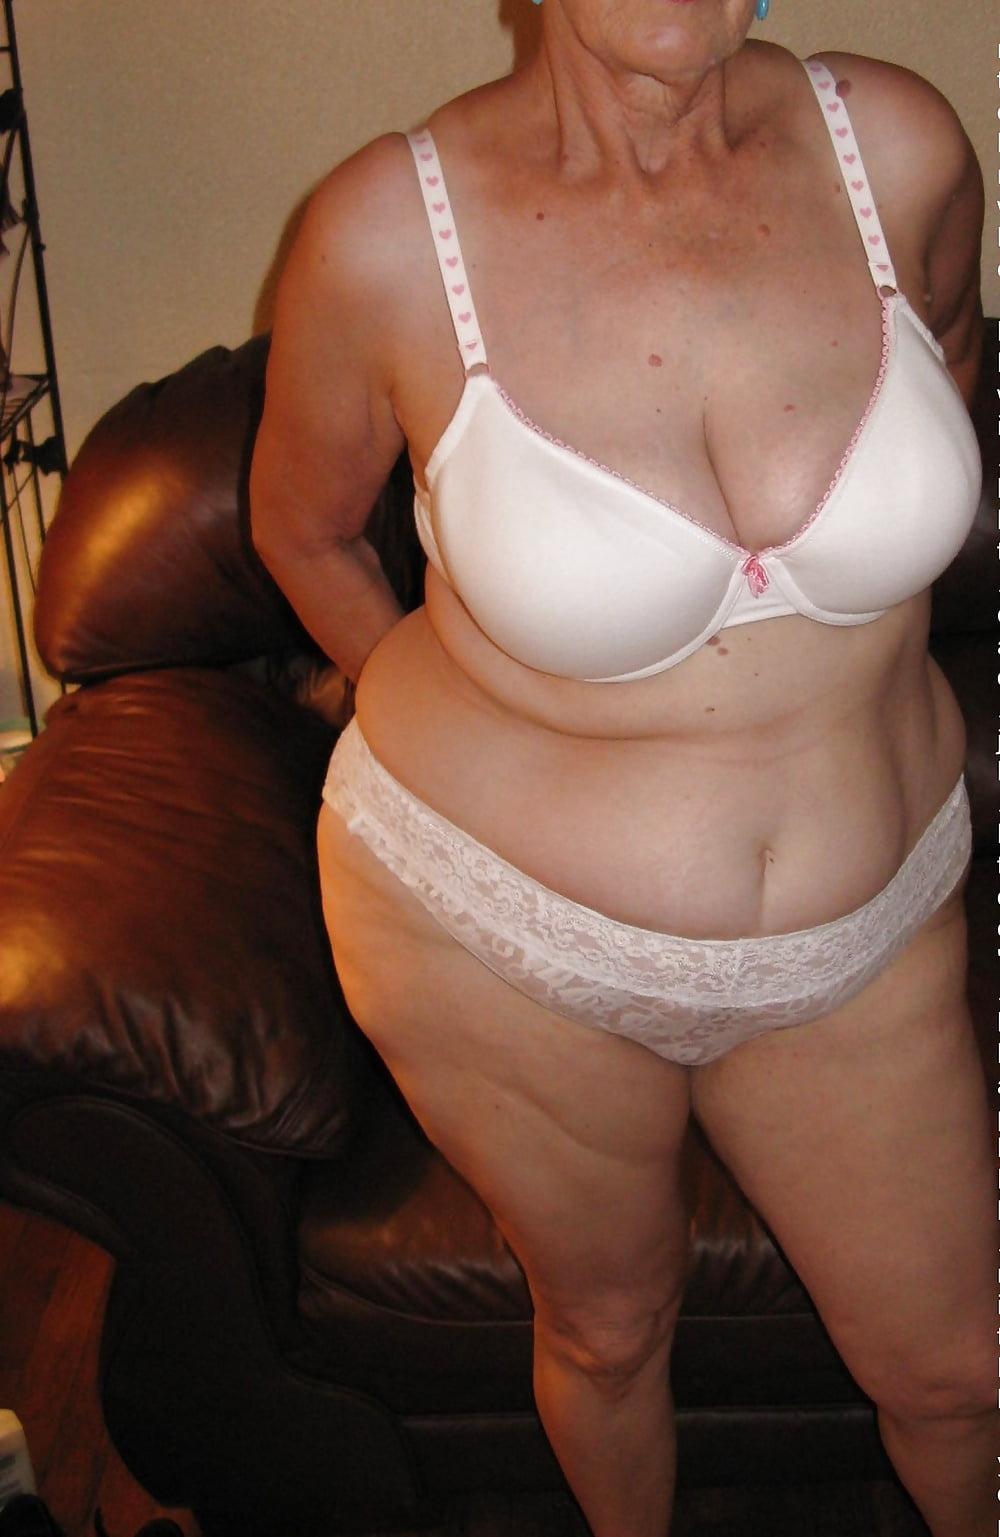 fat-granny-with-glasses-nude-korea-south